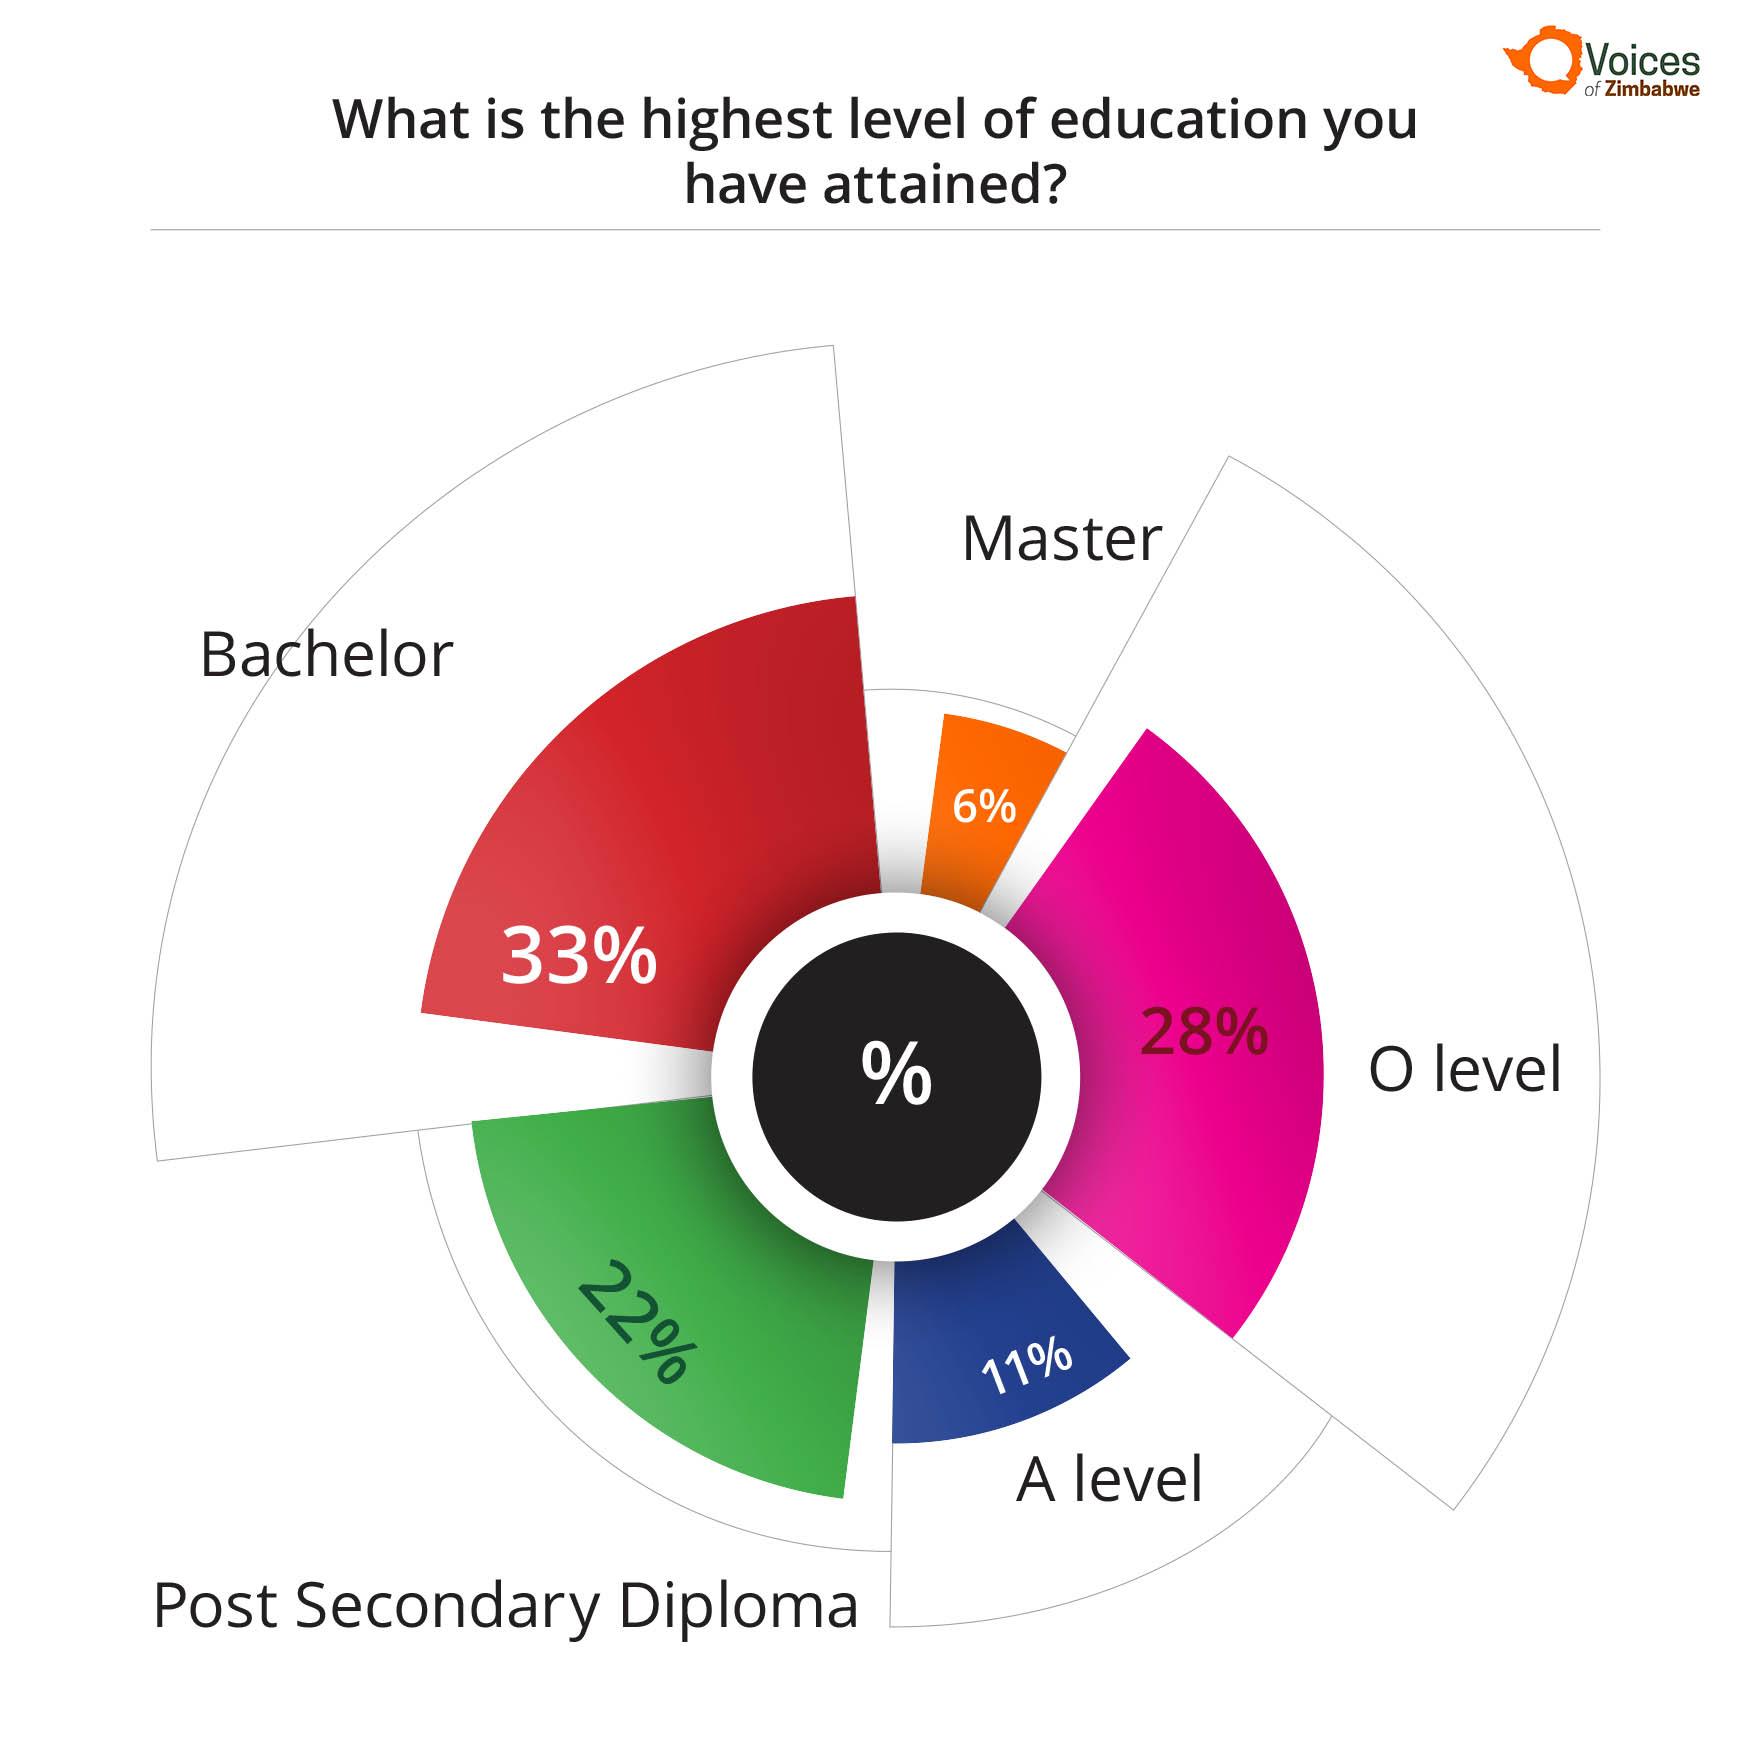 8_1 highest level of education